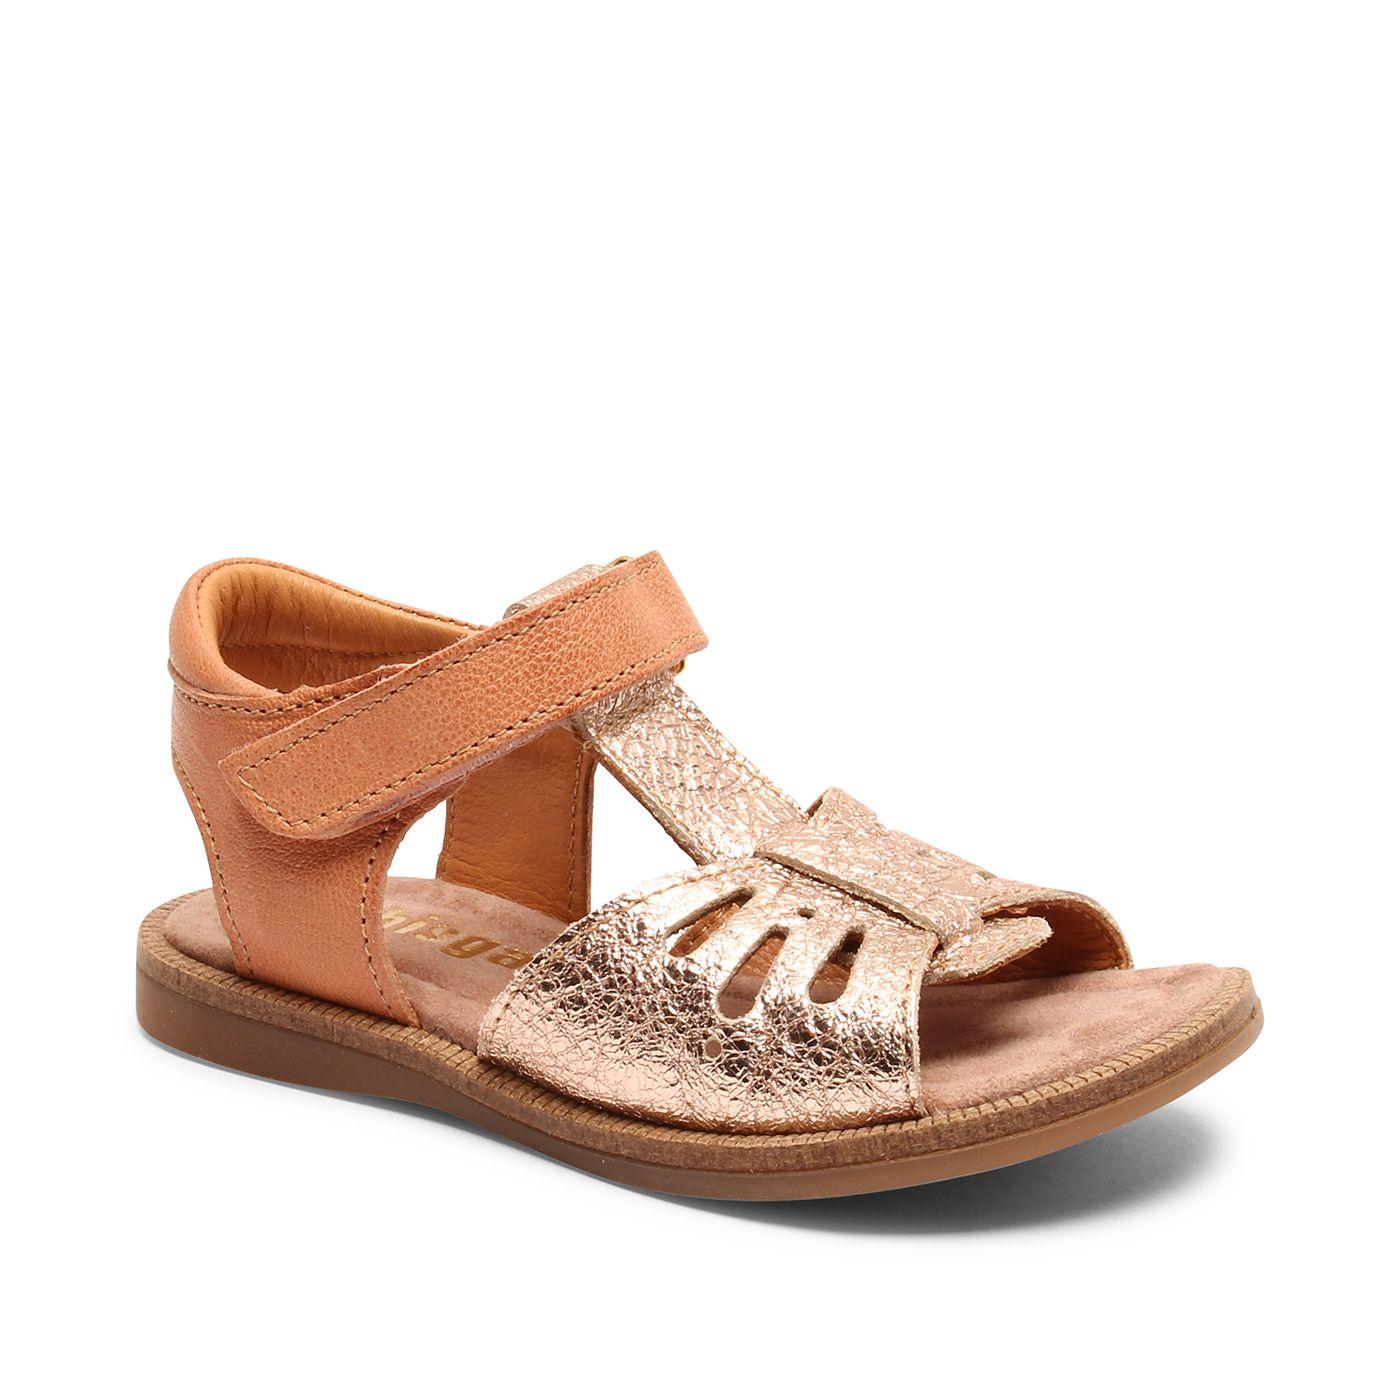 Bisgaard dívčí kožené sandály 70291 - 1623